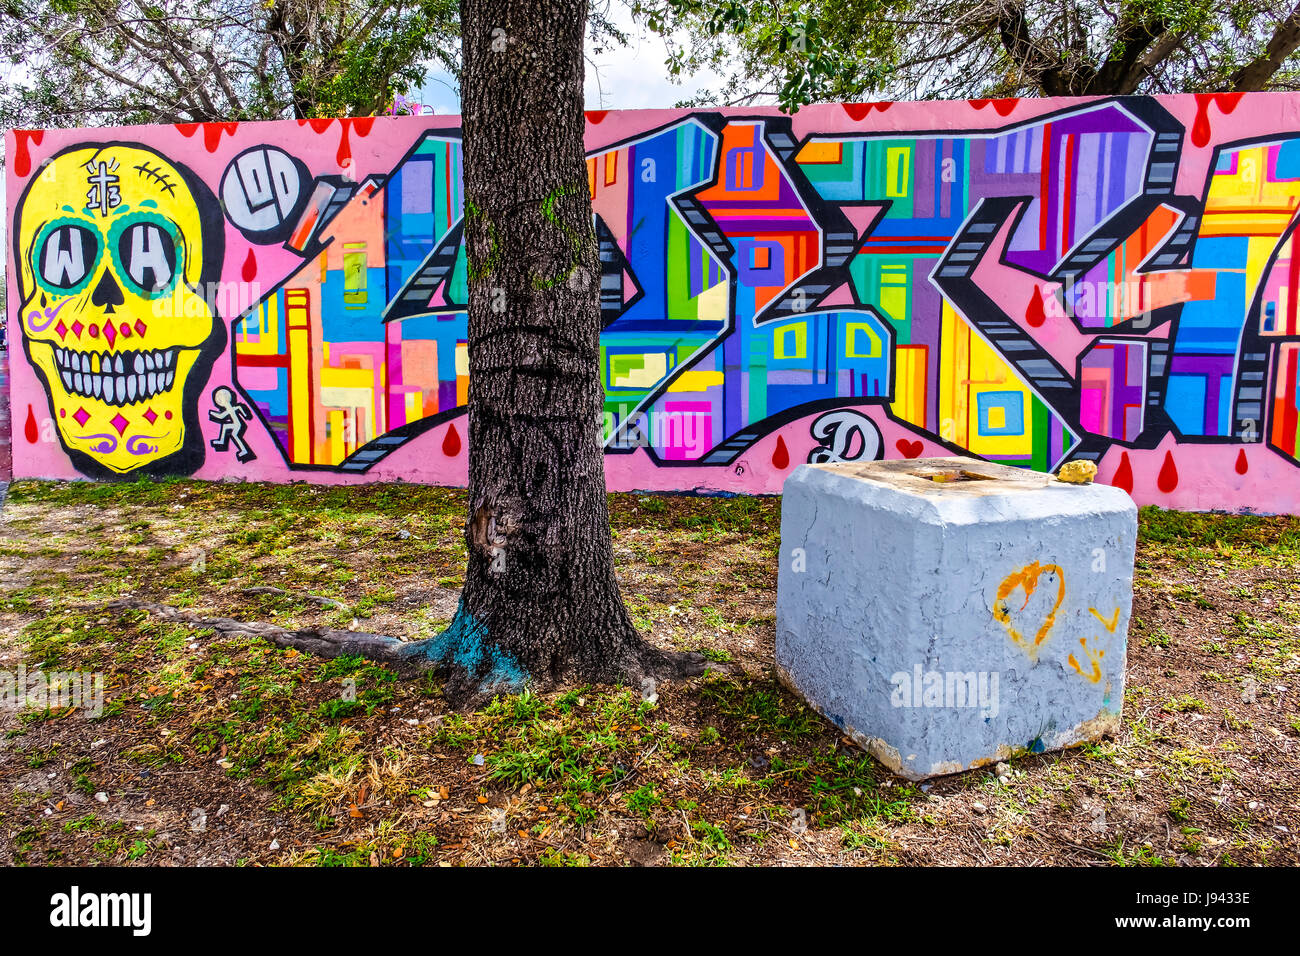 Graffiti wall usa - Graffiti Wall Wynwood Art District Miami Florida Usa